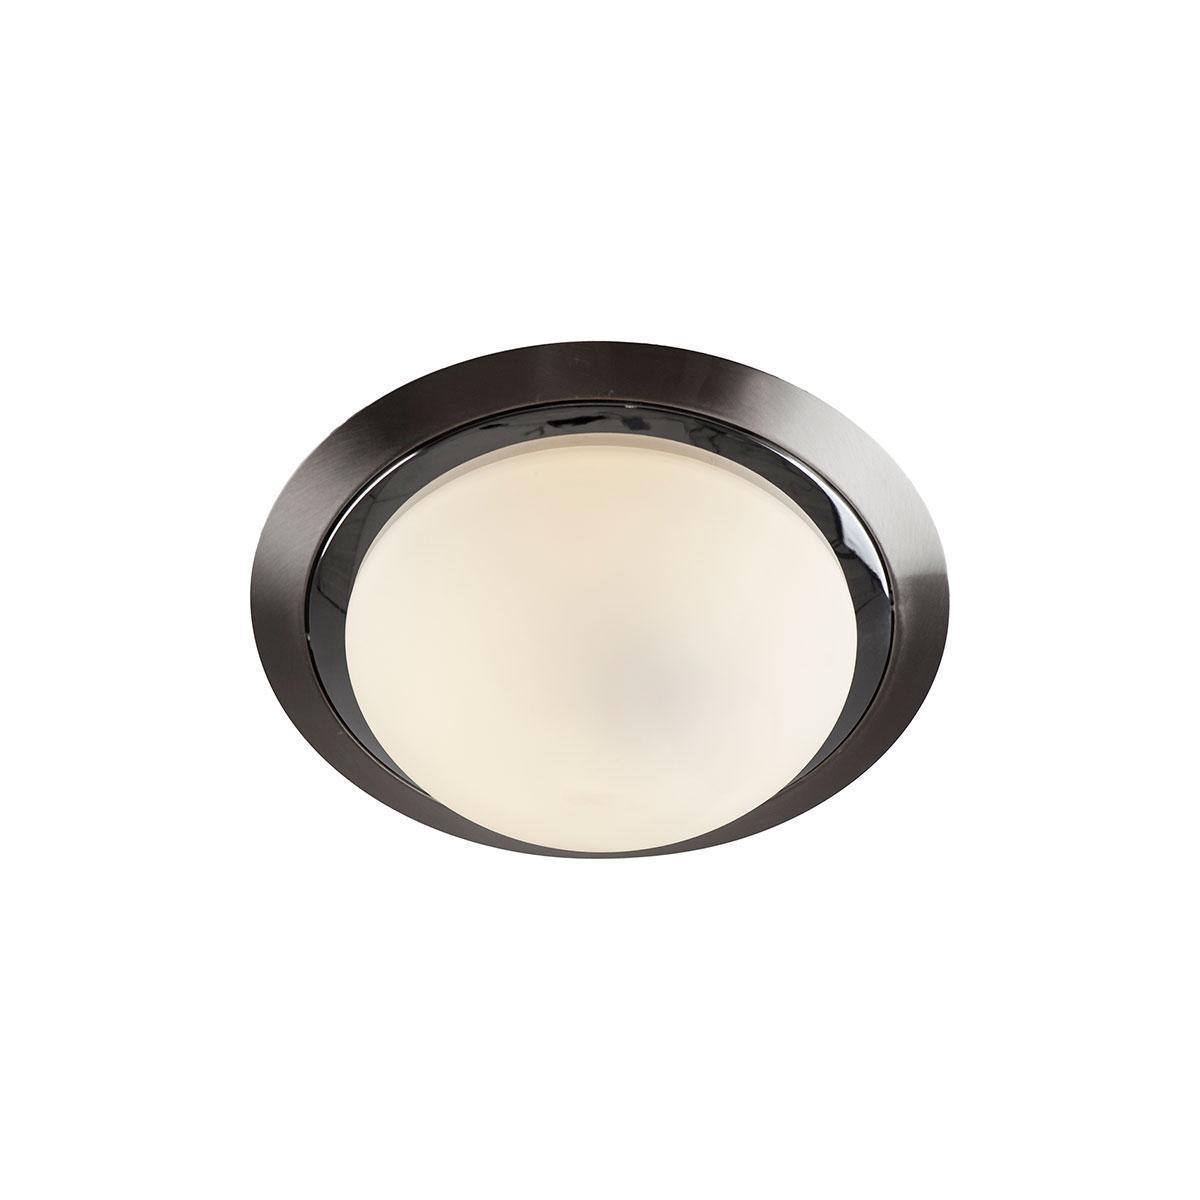 Потолочный светильник IDLamp Alessa 371/15PF-Whitechrome